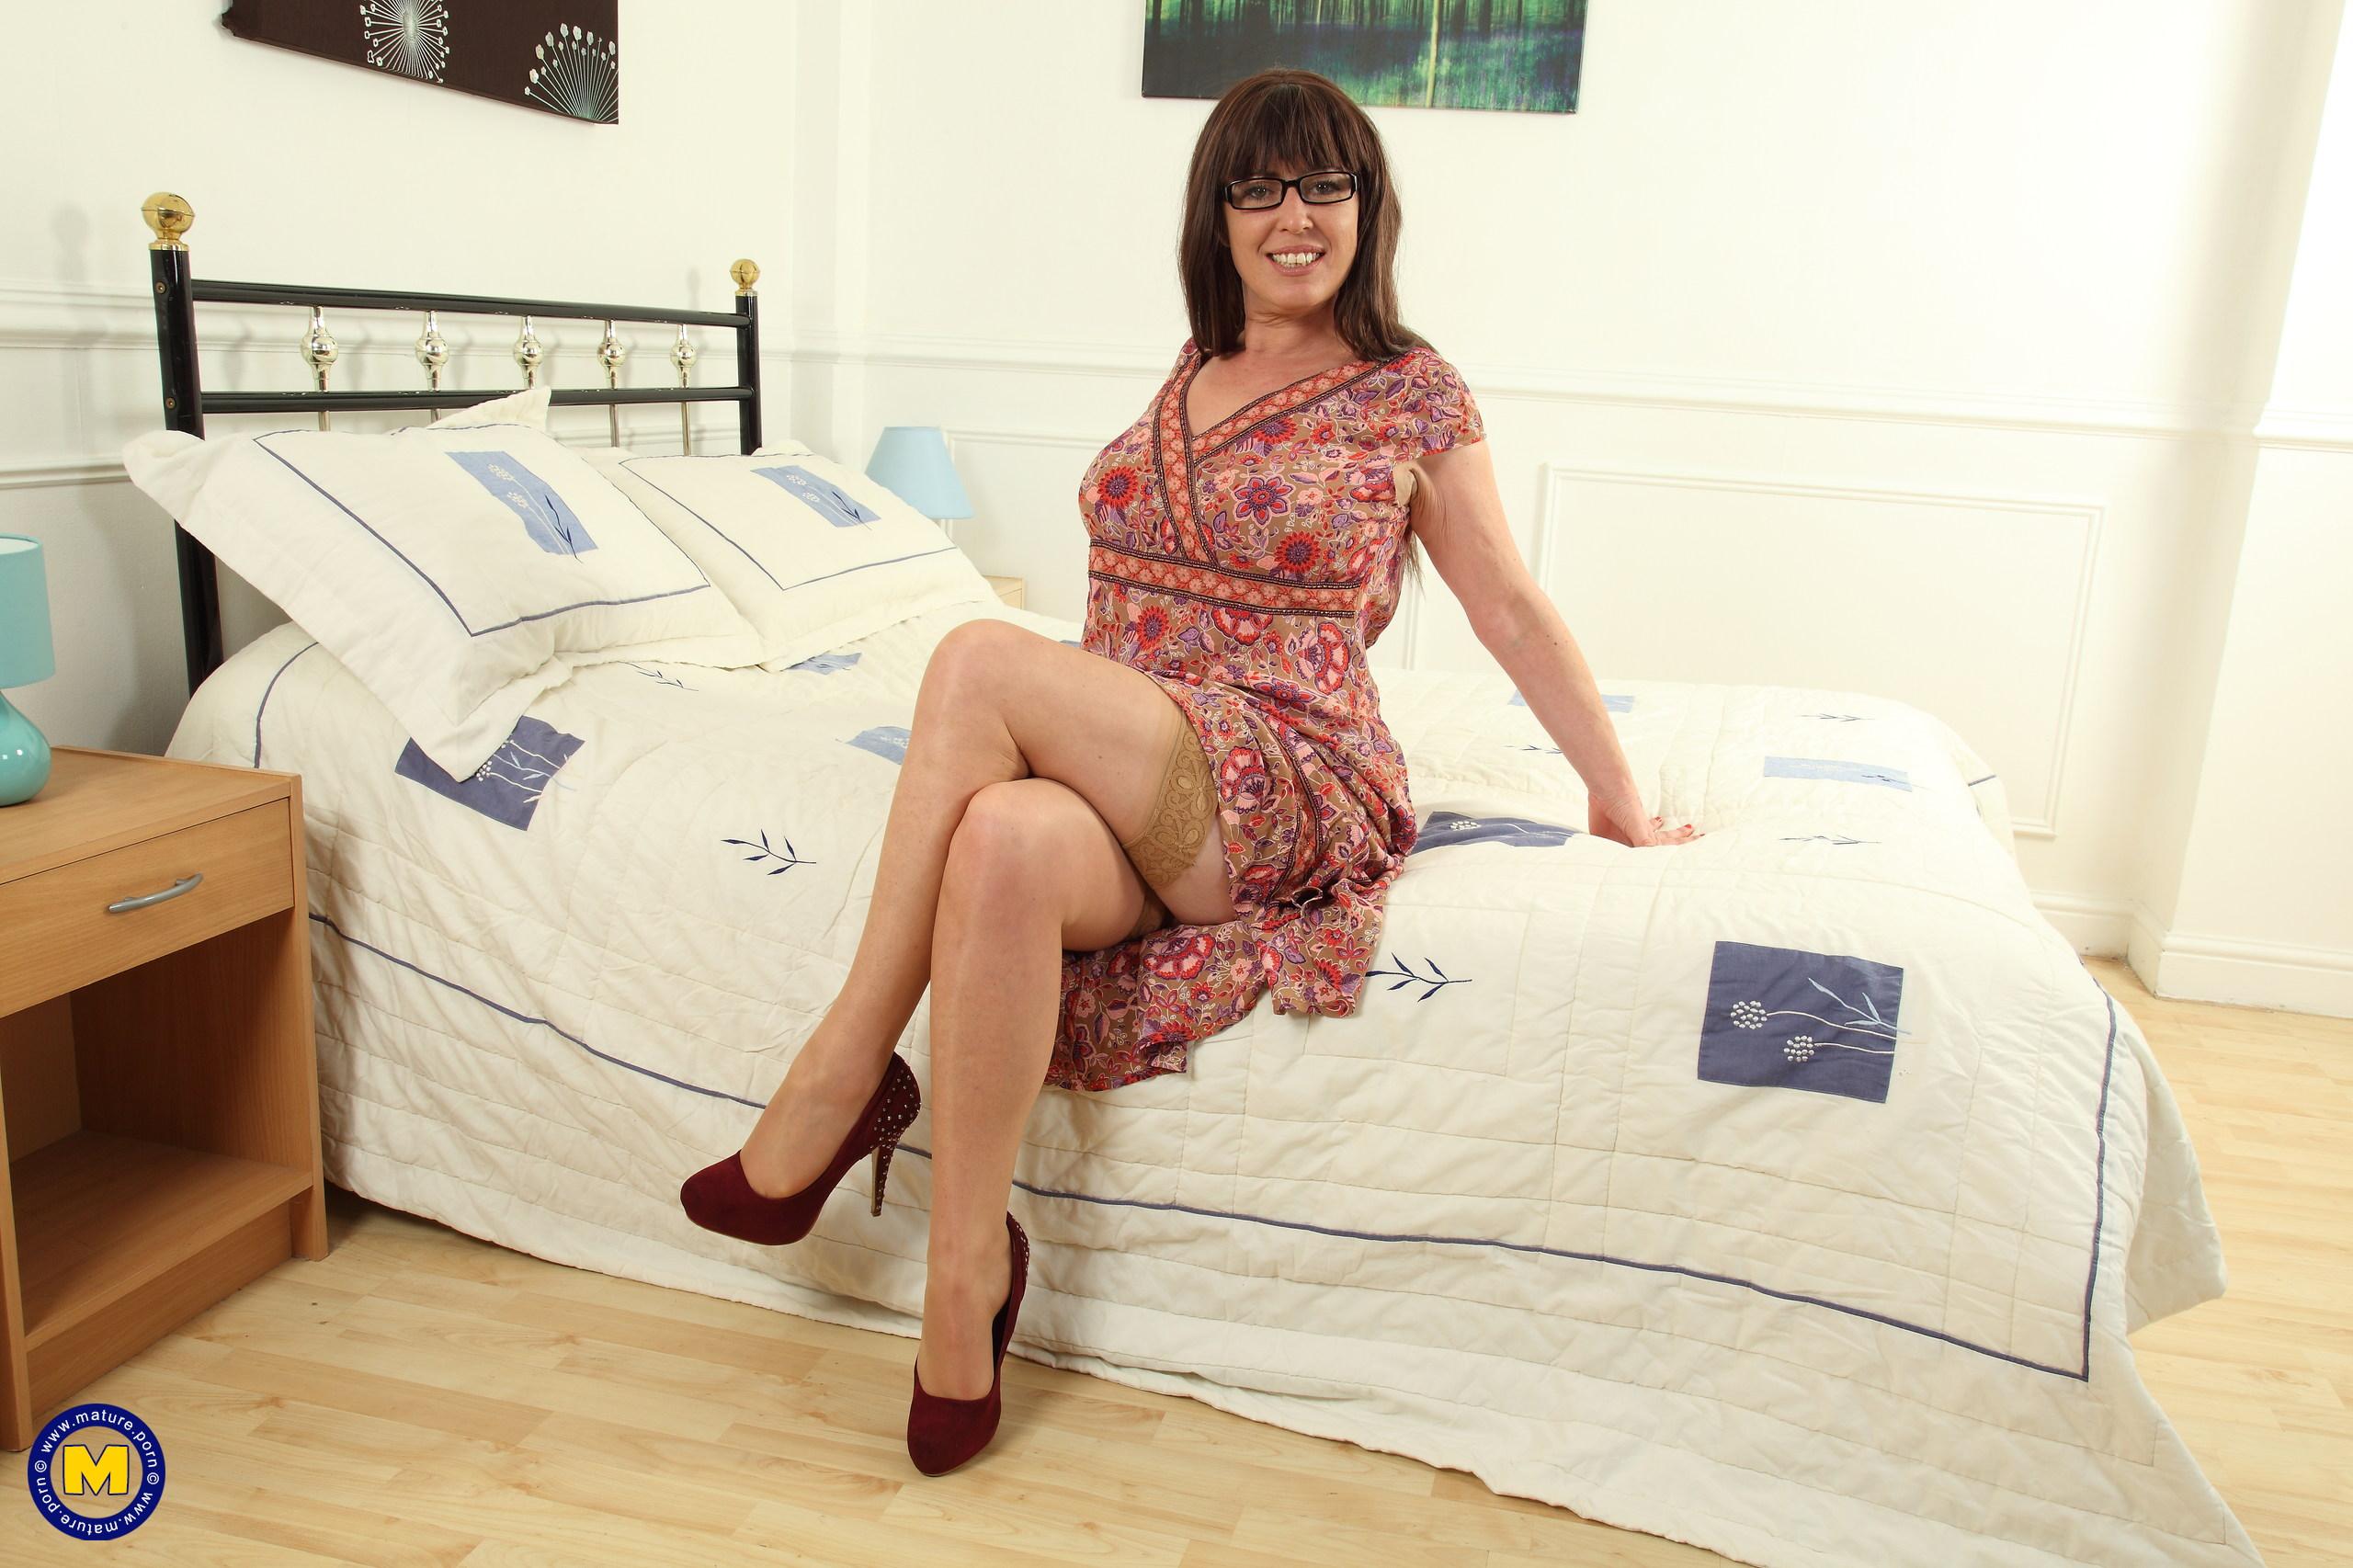 Valerie cormier playboy